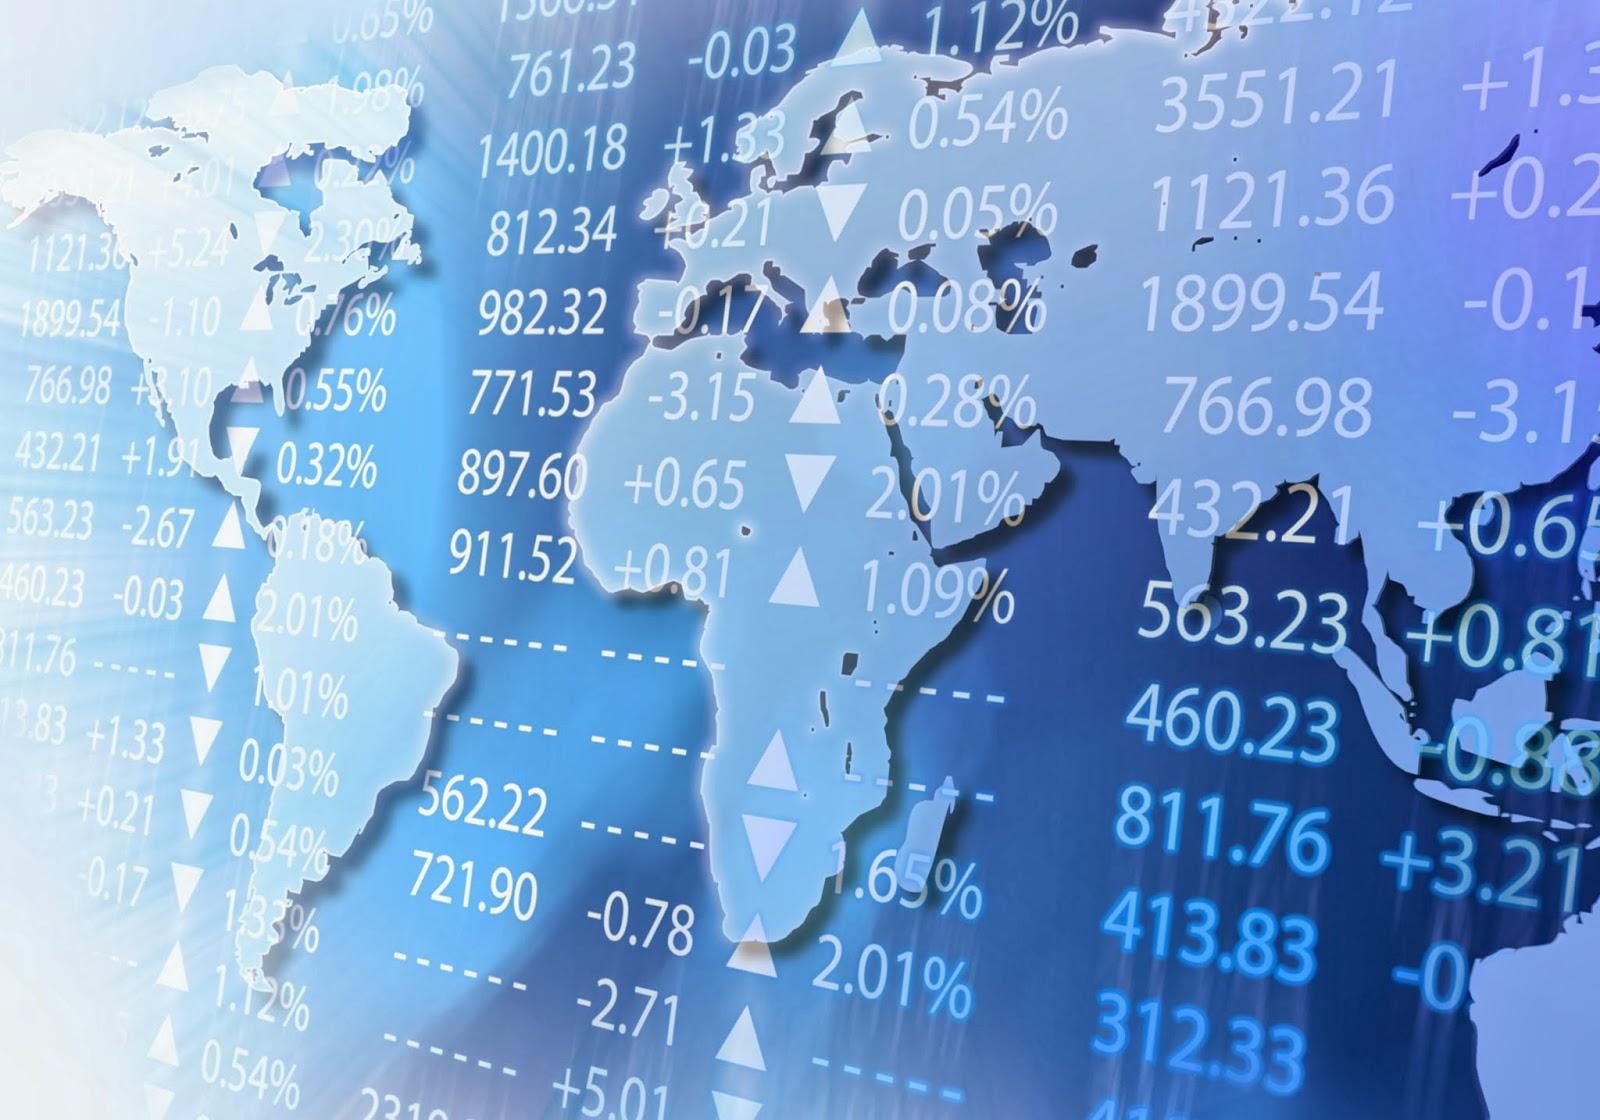 Ebs fx trading system